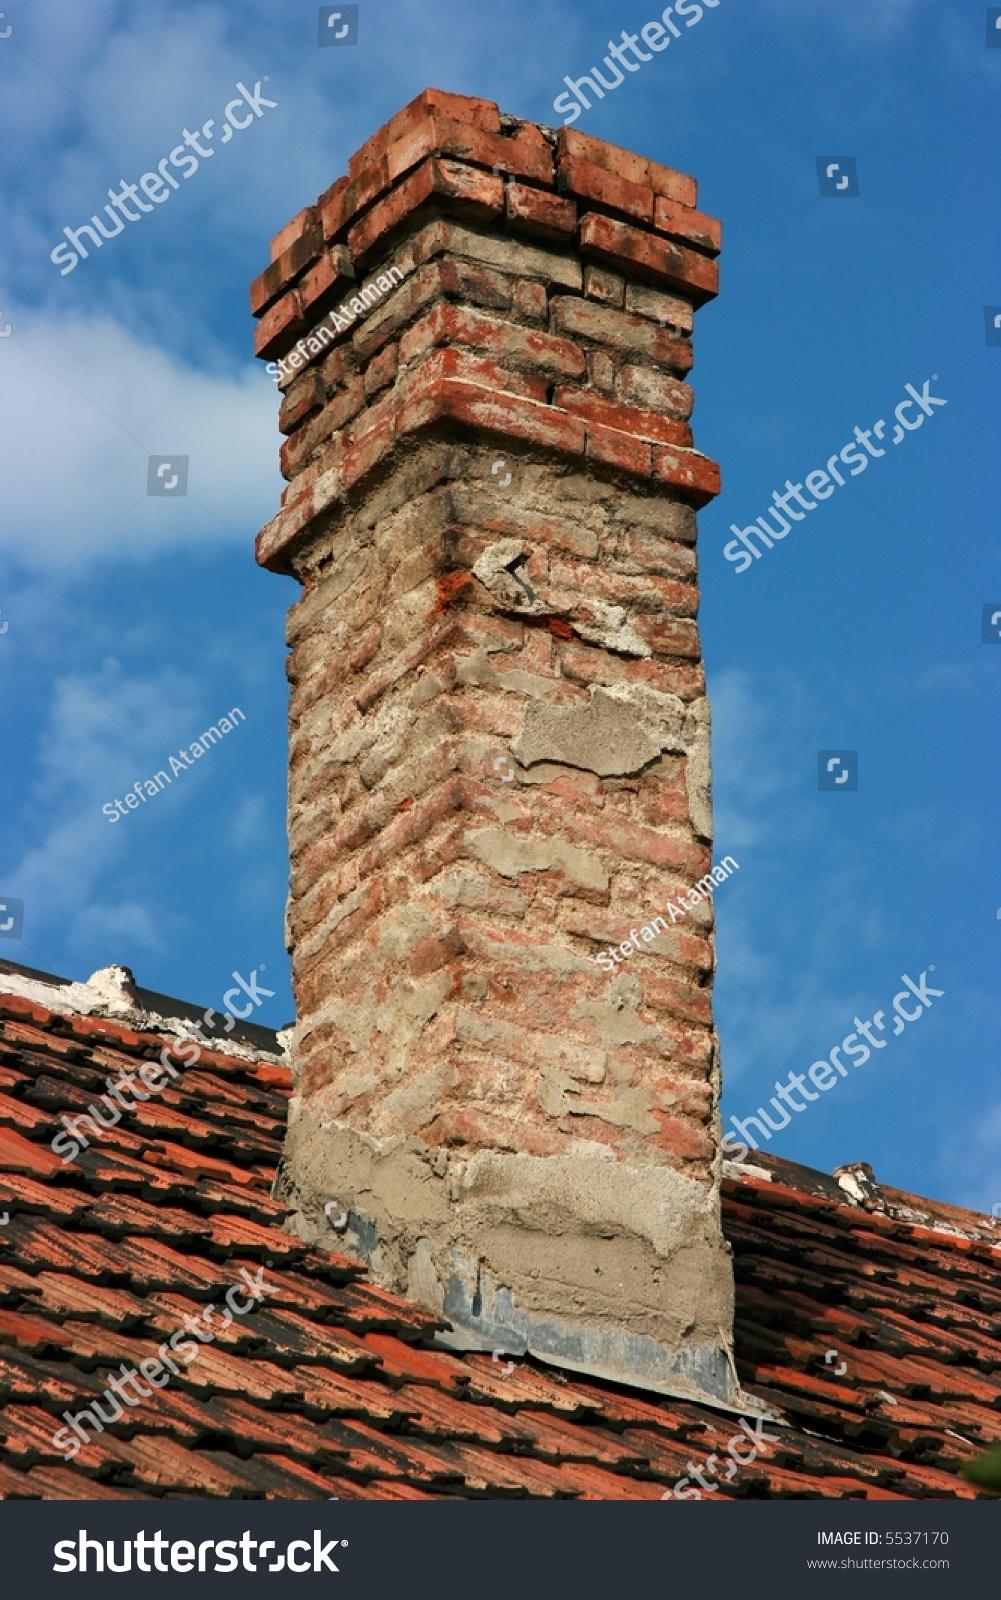 Brick Chimney Stock Photo 5537170 Shutterstock